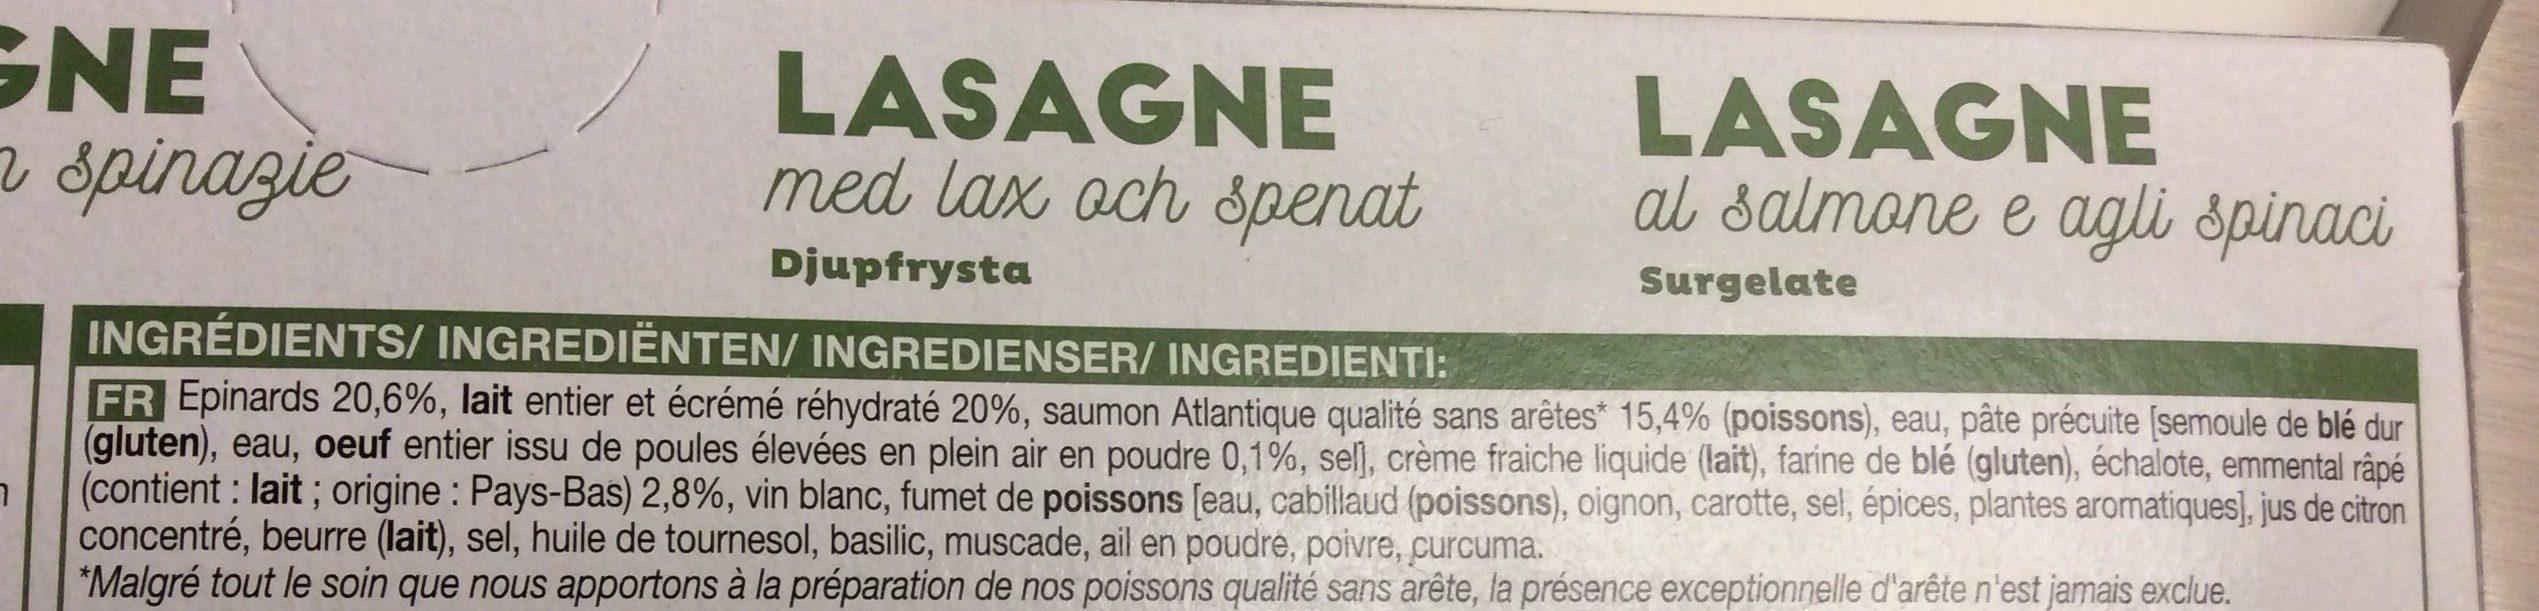 Lasagnes saumon, epinard - Ingrediënten - fr